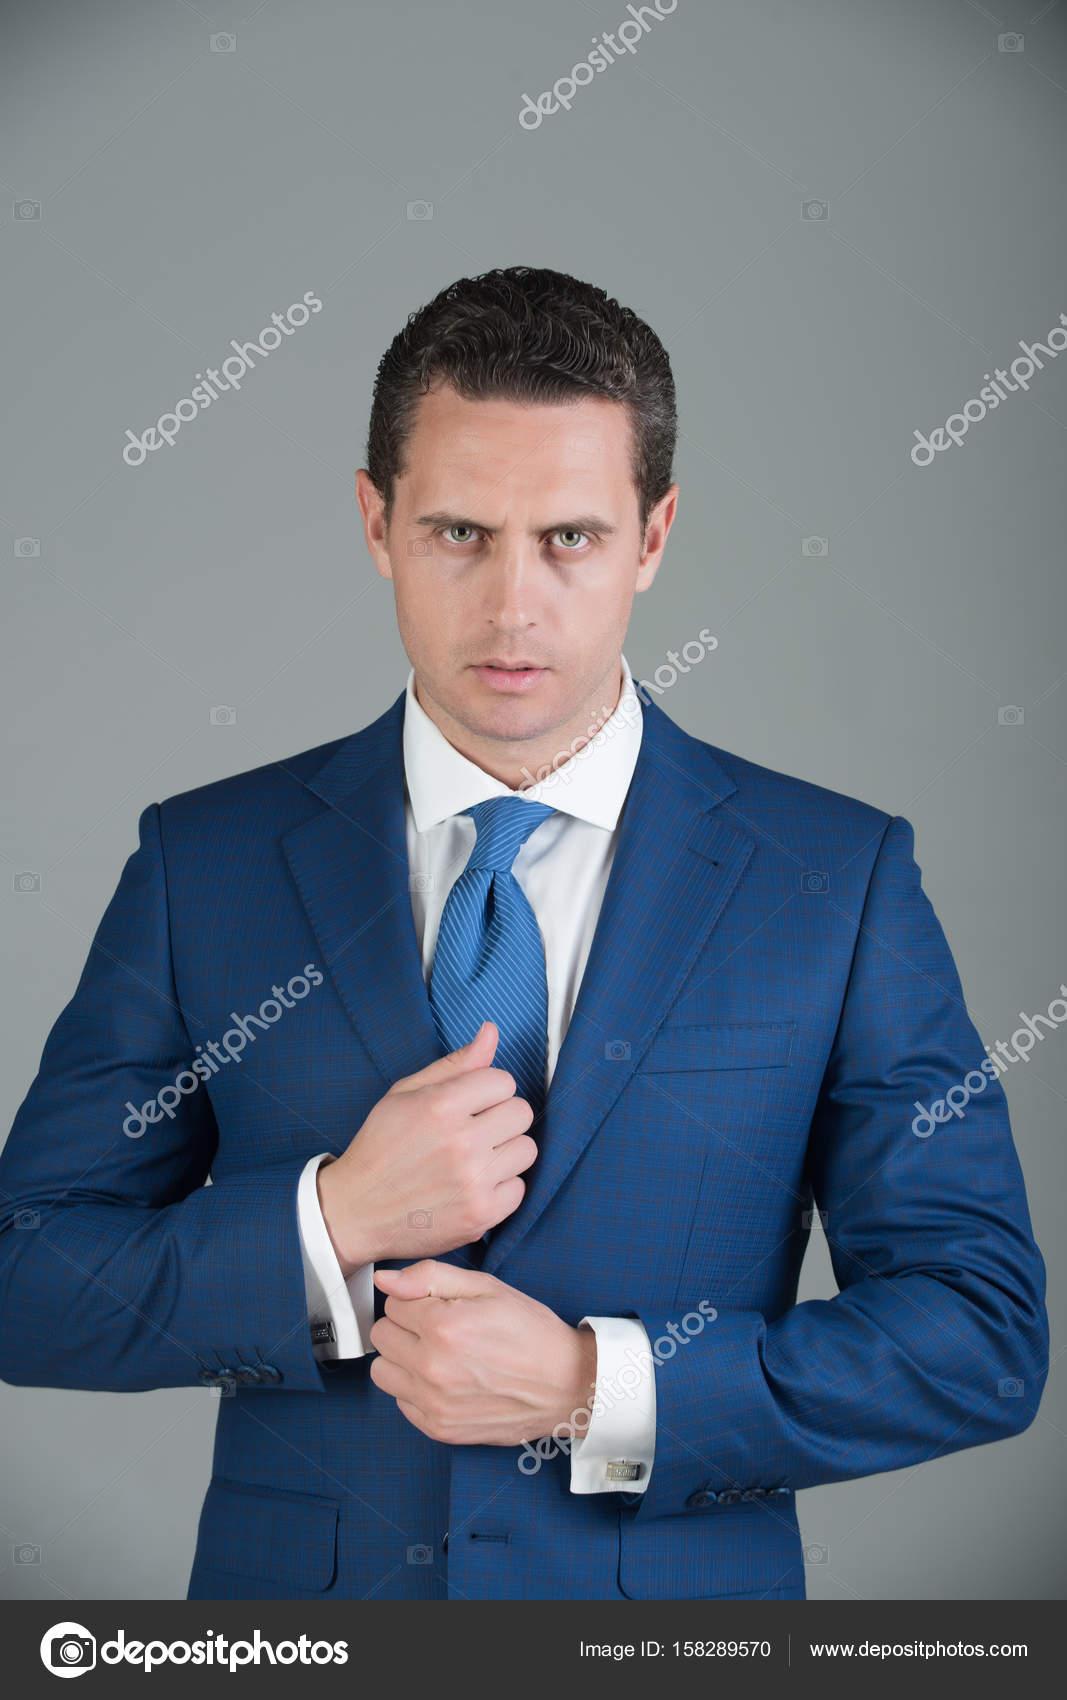 Confident Businessman Posing In Fashionable Blue Formal Suit Jacket